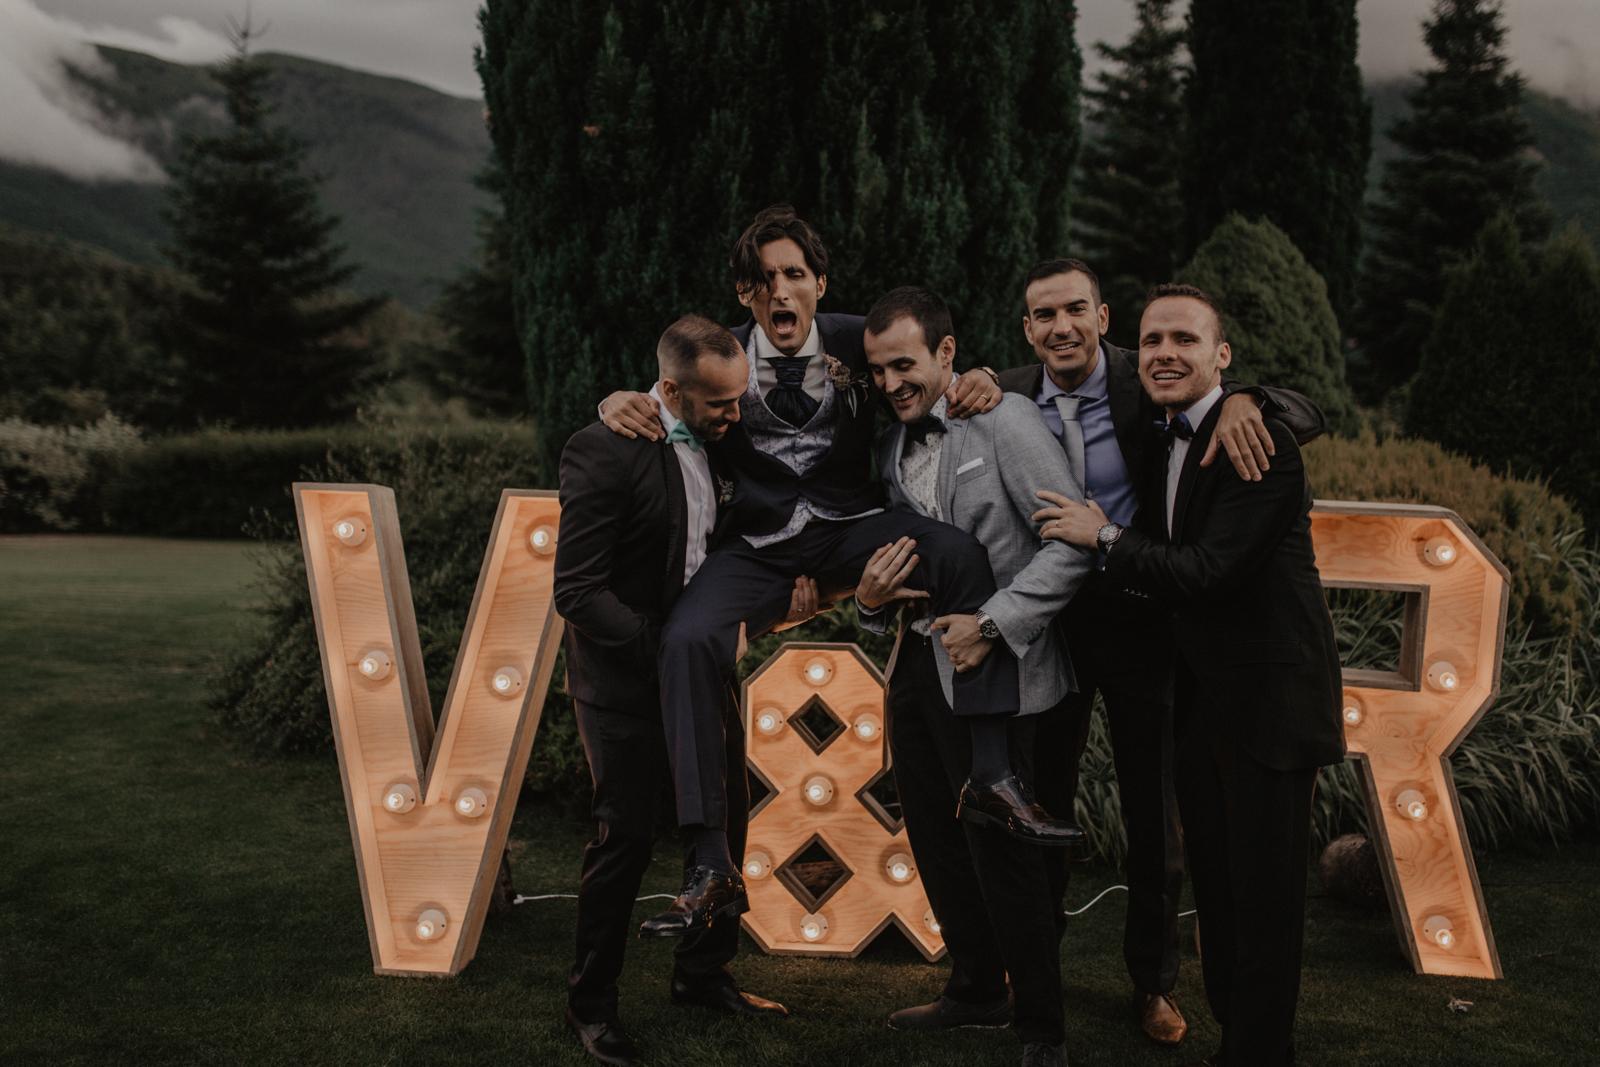 thenortherngirlphotography_photography_thenortherngirl_rebeccascabros_wedding_weddingphotography_weddingphotographer_barcelona_bodaenbarcelona_bodaenmaselmarti_bodarogeryvane-645.jpg